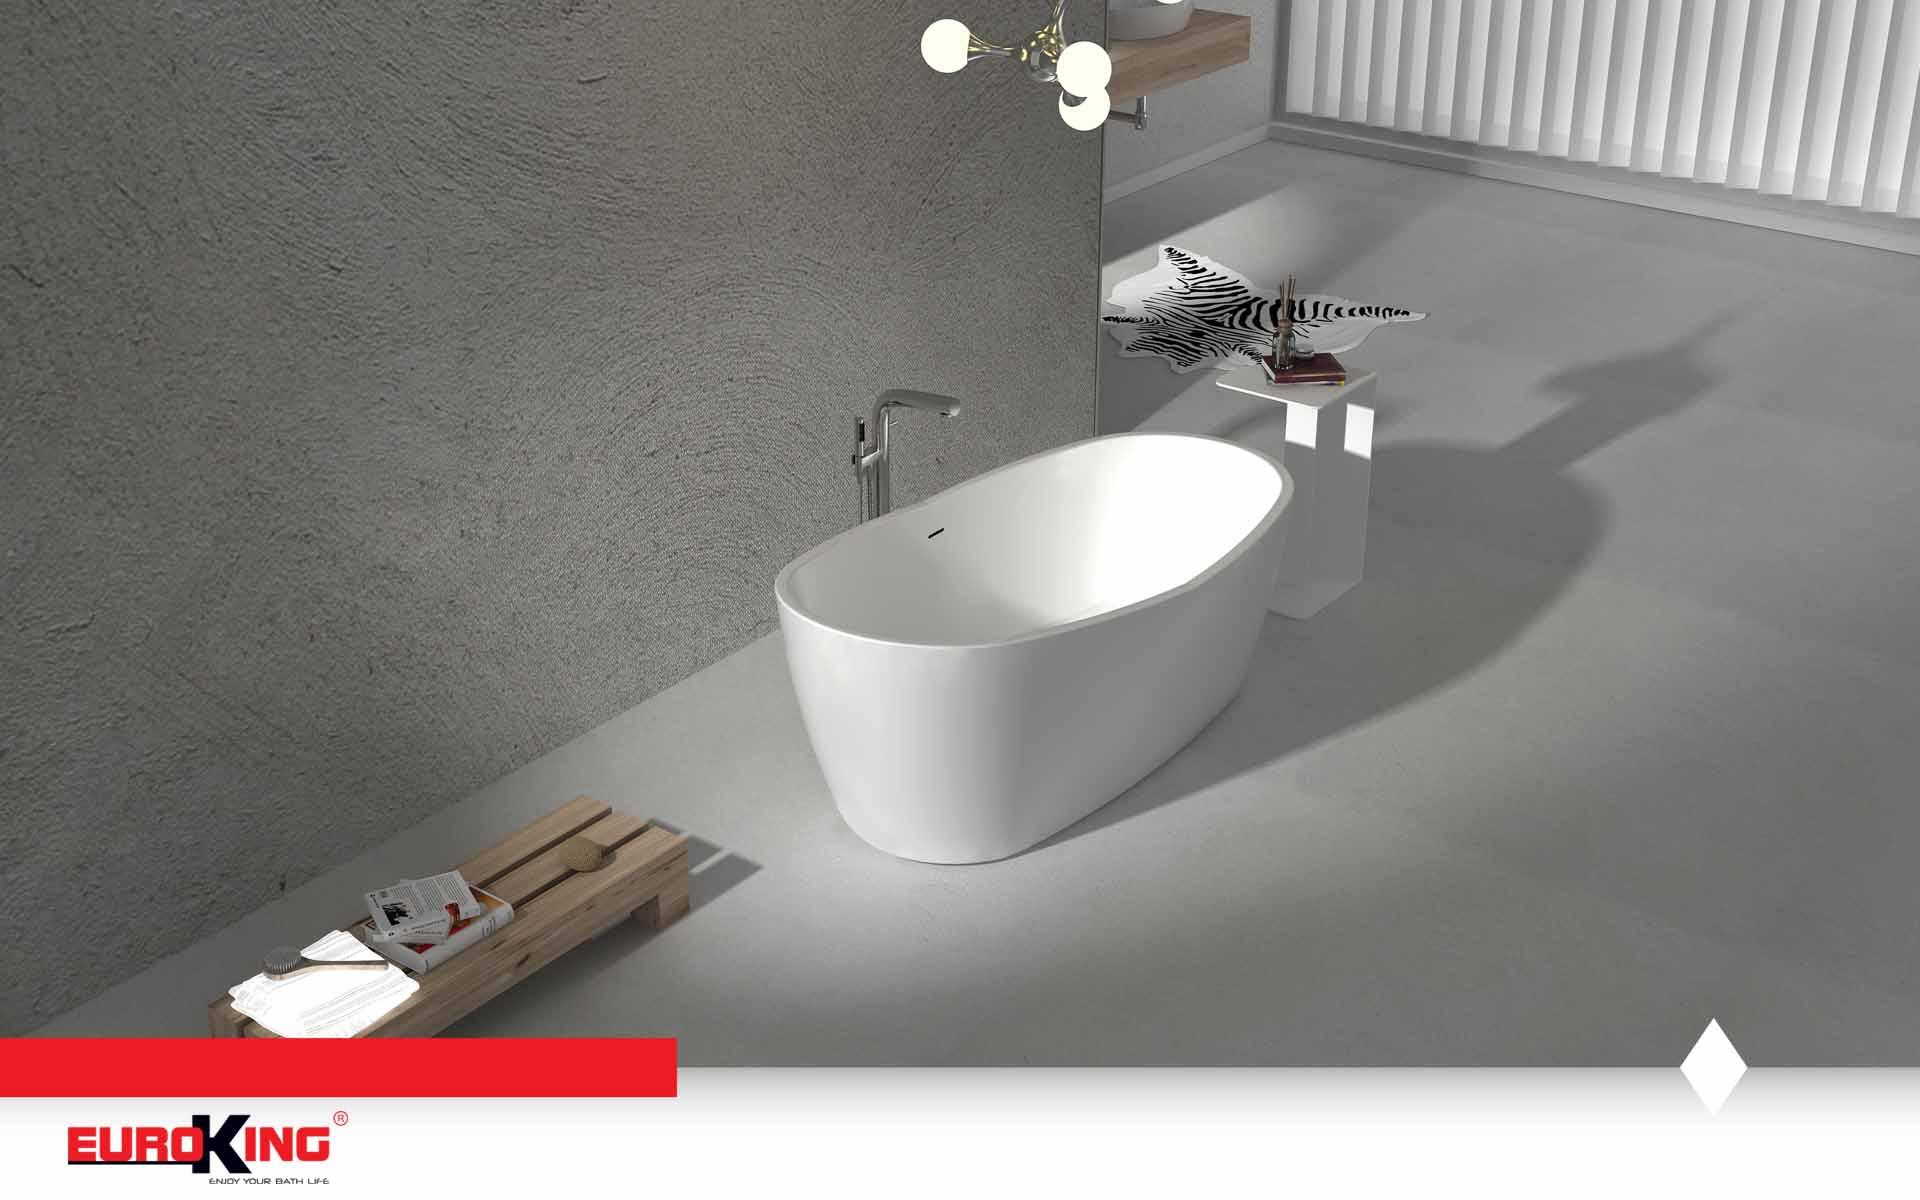 Bồn Louise EU-6037 (màu trắng)